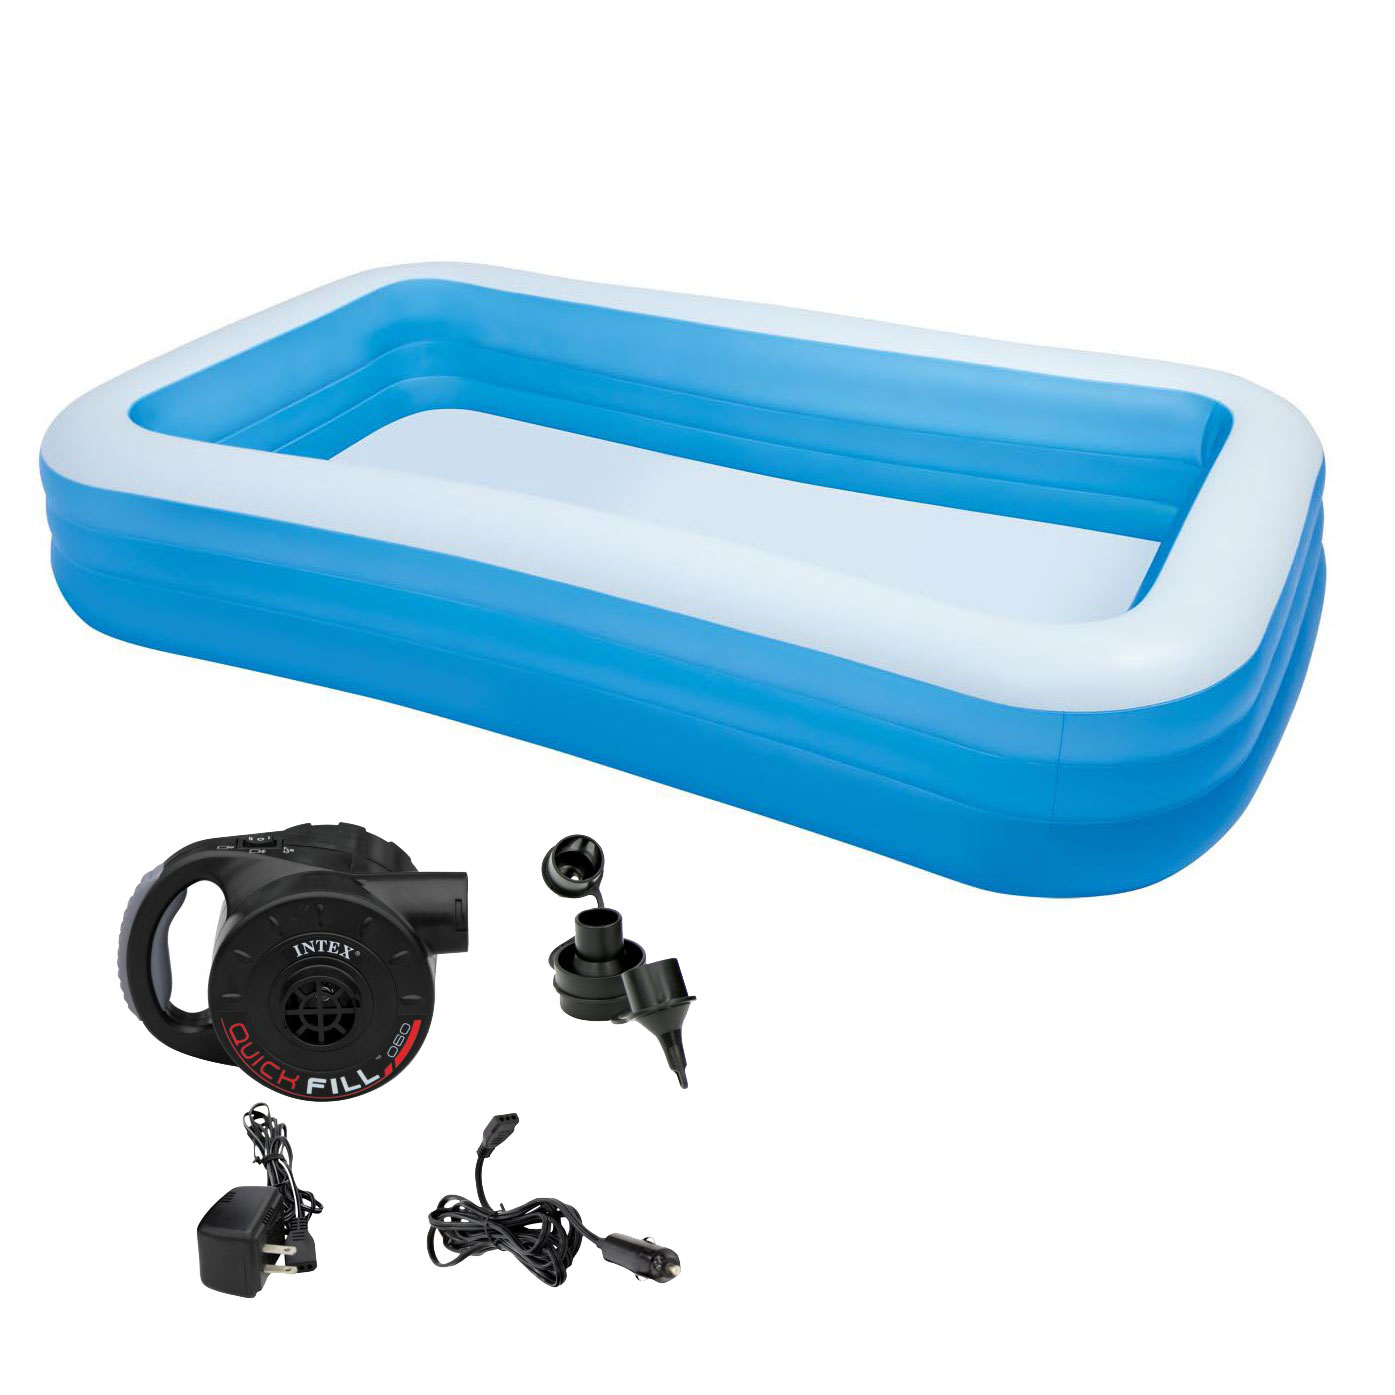 Intex Swim Center Family 72 x 120 Inch Swimming Pool & Battery Powered Air Pump